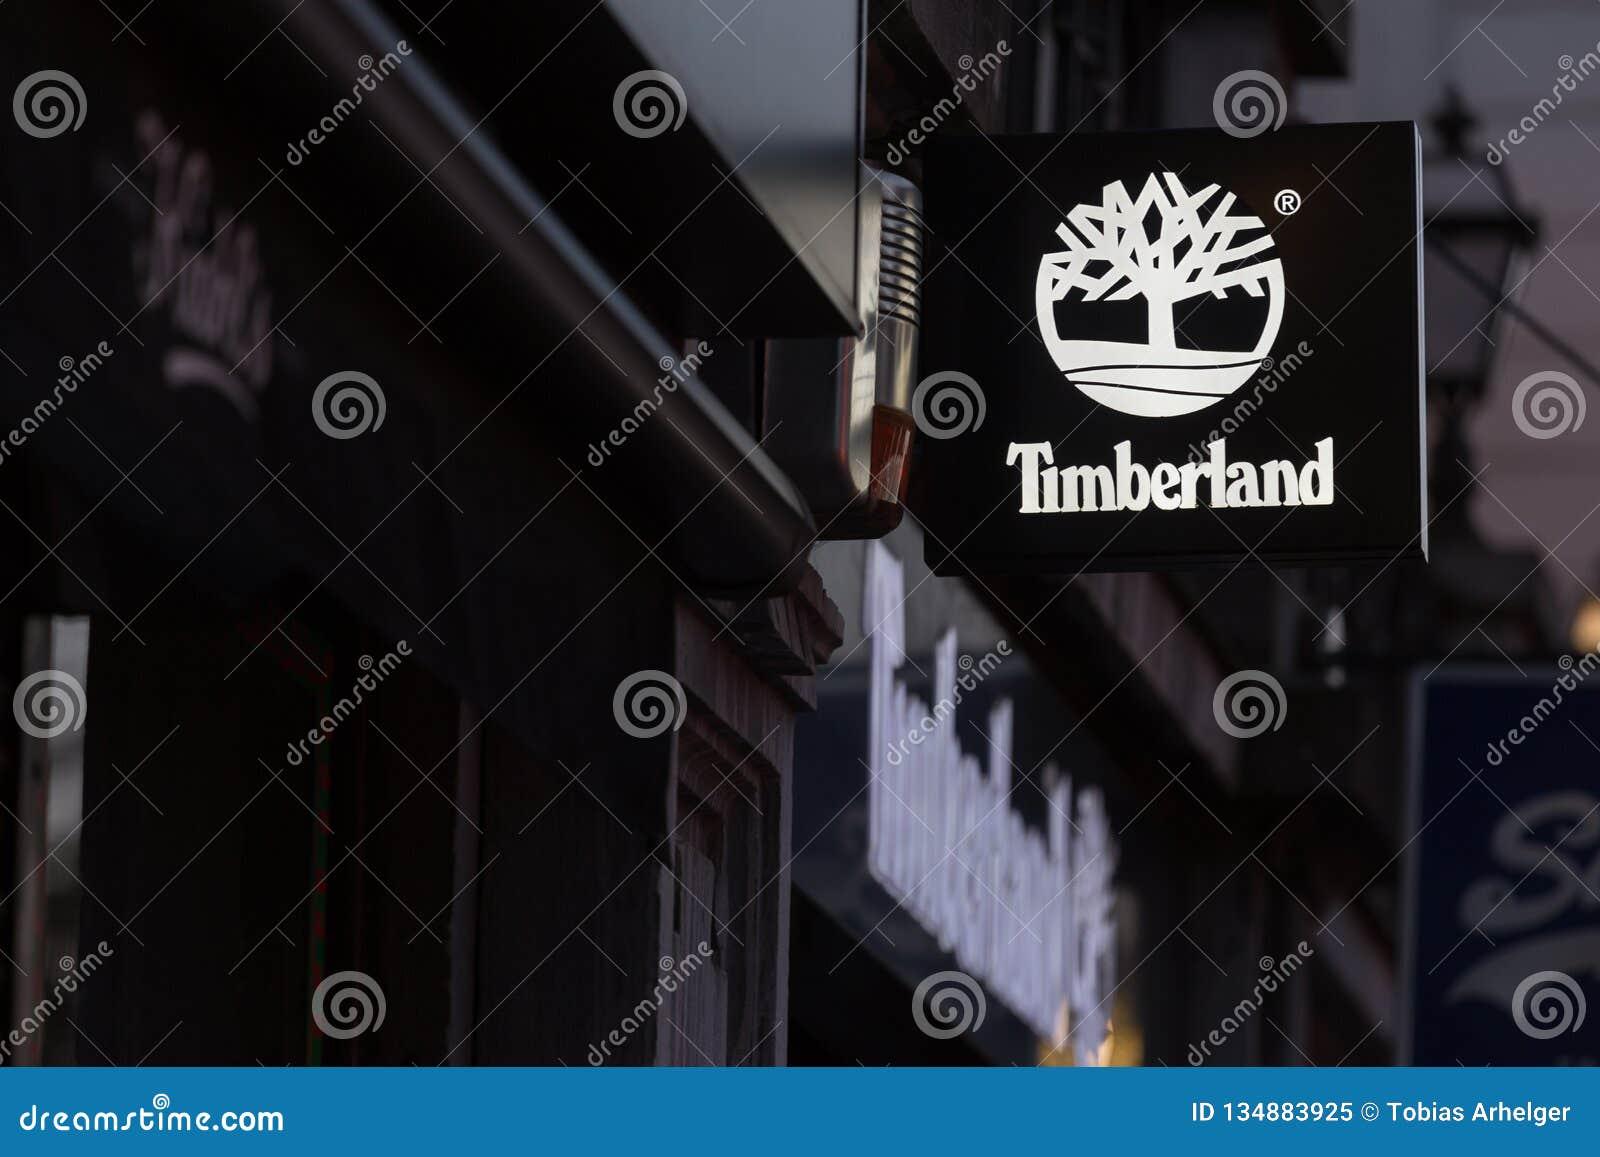 Bruxelas, Bruxelas/Bélgica - 13 12 18: o timberland assina dentro Bruxelas Bélgica